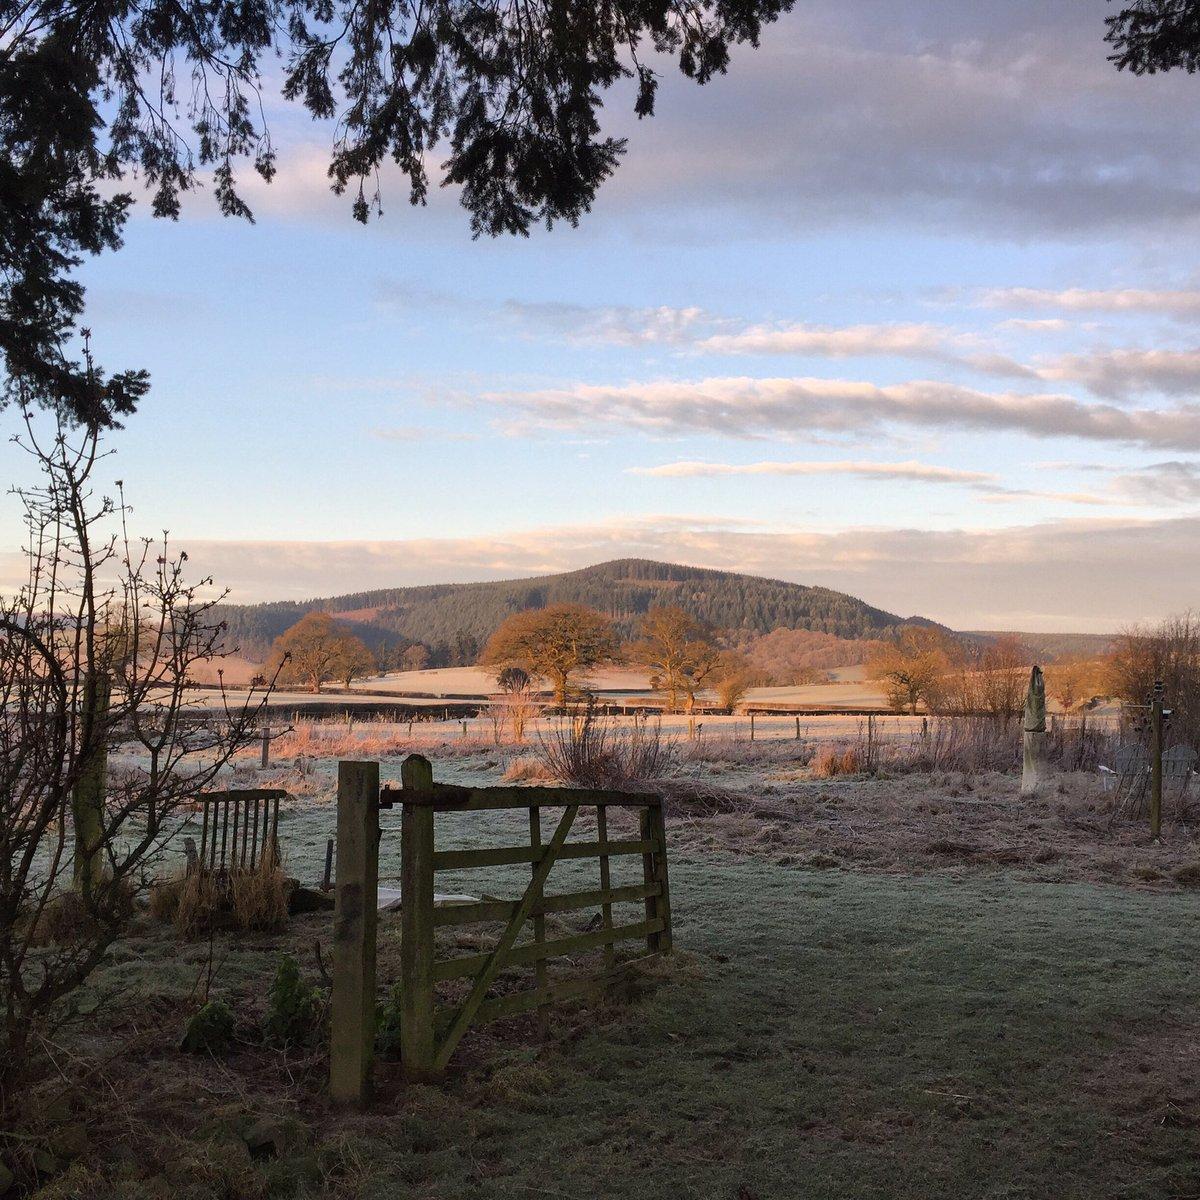 Frost Shropshire Morning -4 degrees C https://t.co/qgTpqXCjaS